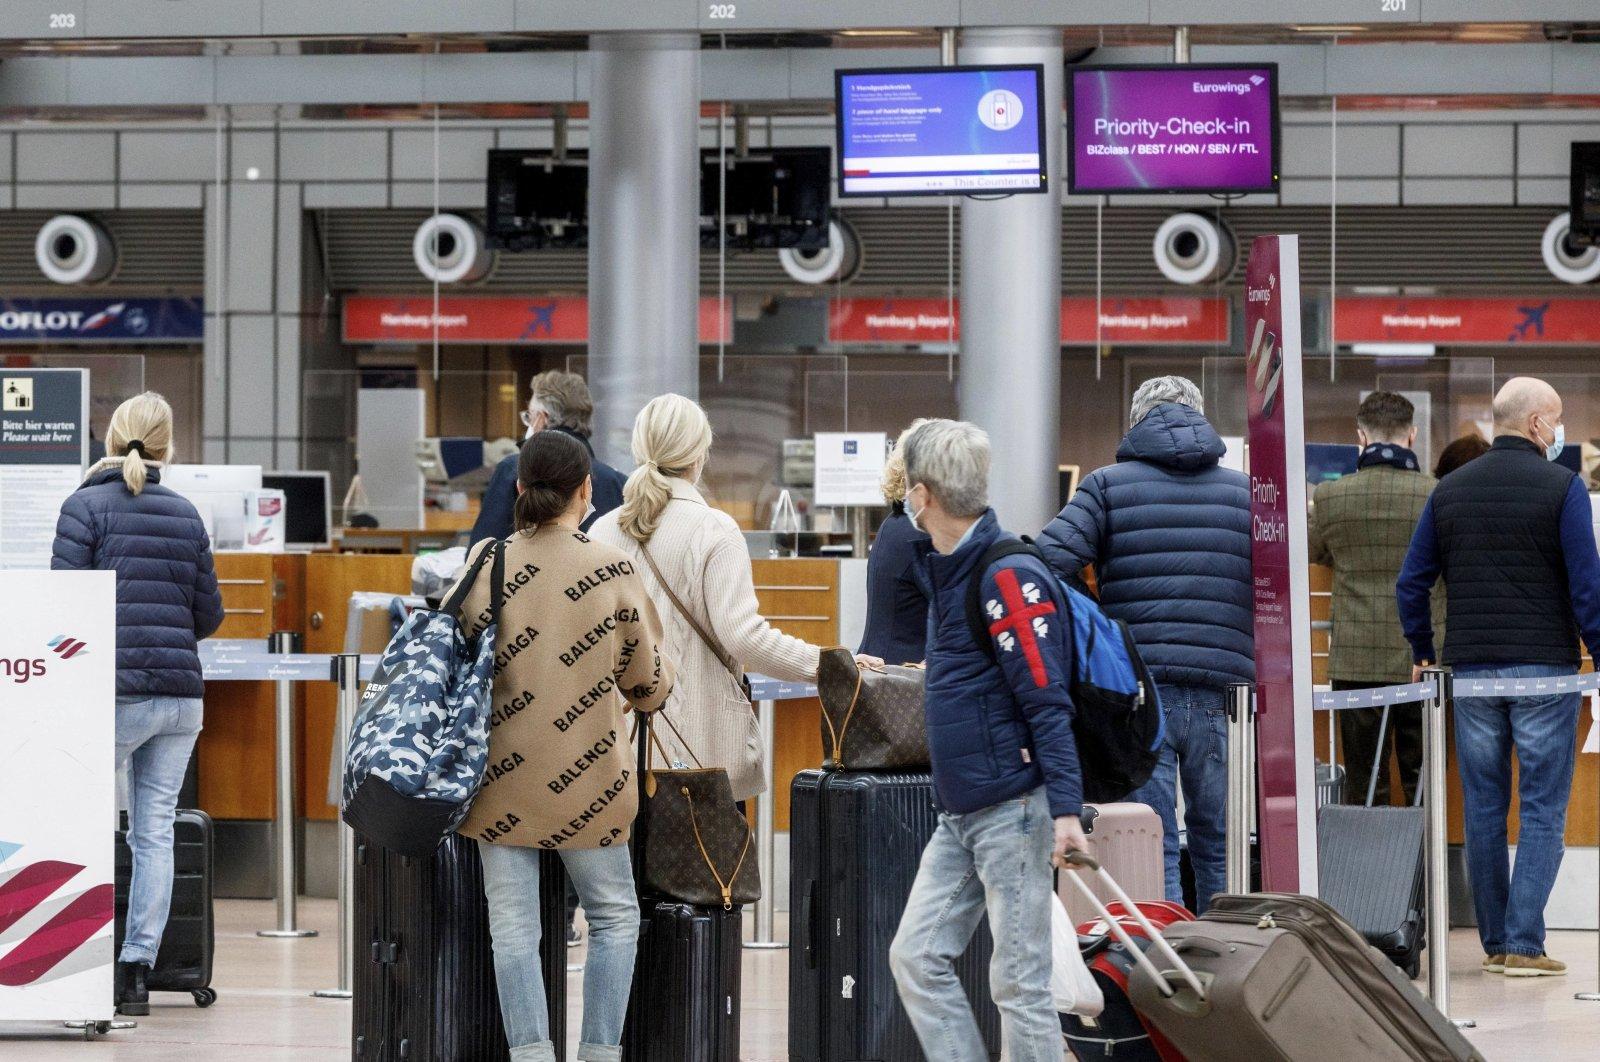 Passengers check in at Hamburg Airport, Germany, March 14, 2021. (AP Photo)